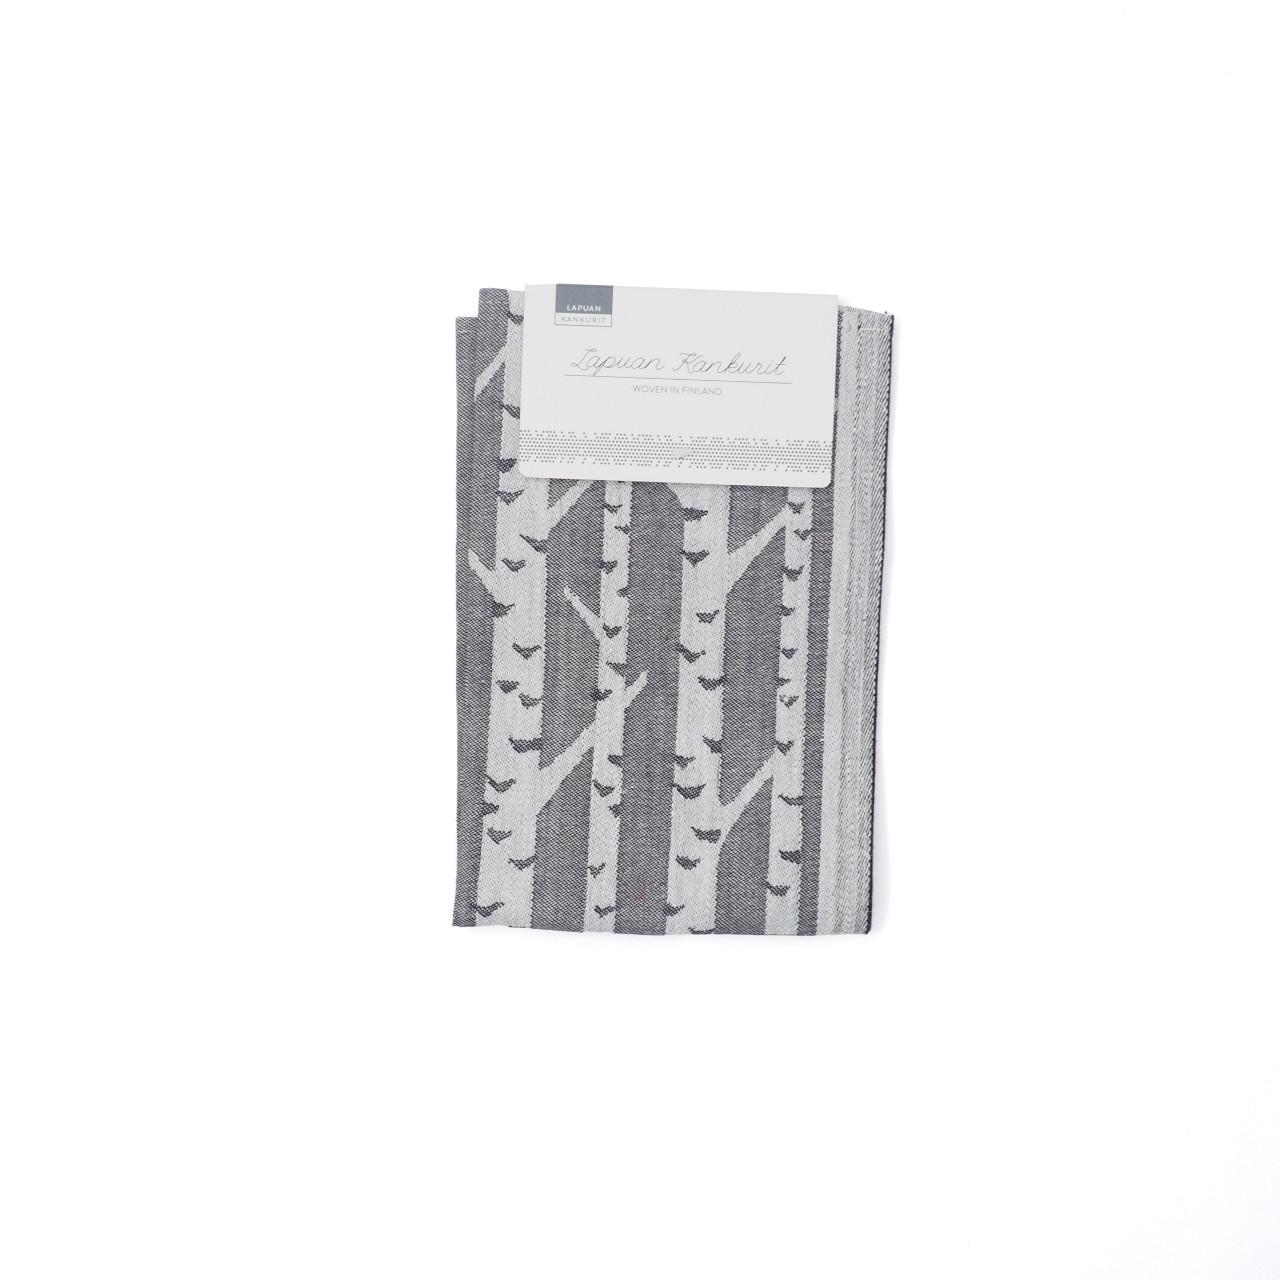 KOIVU towel LAPUAN KANKURIT ラプアンカンクリ